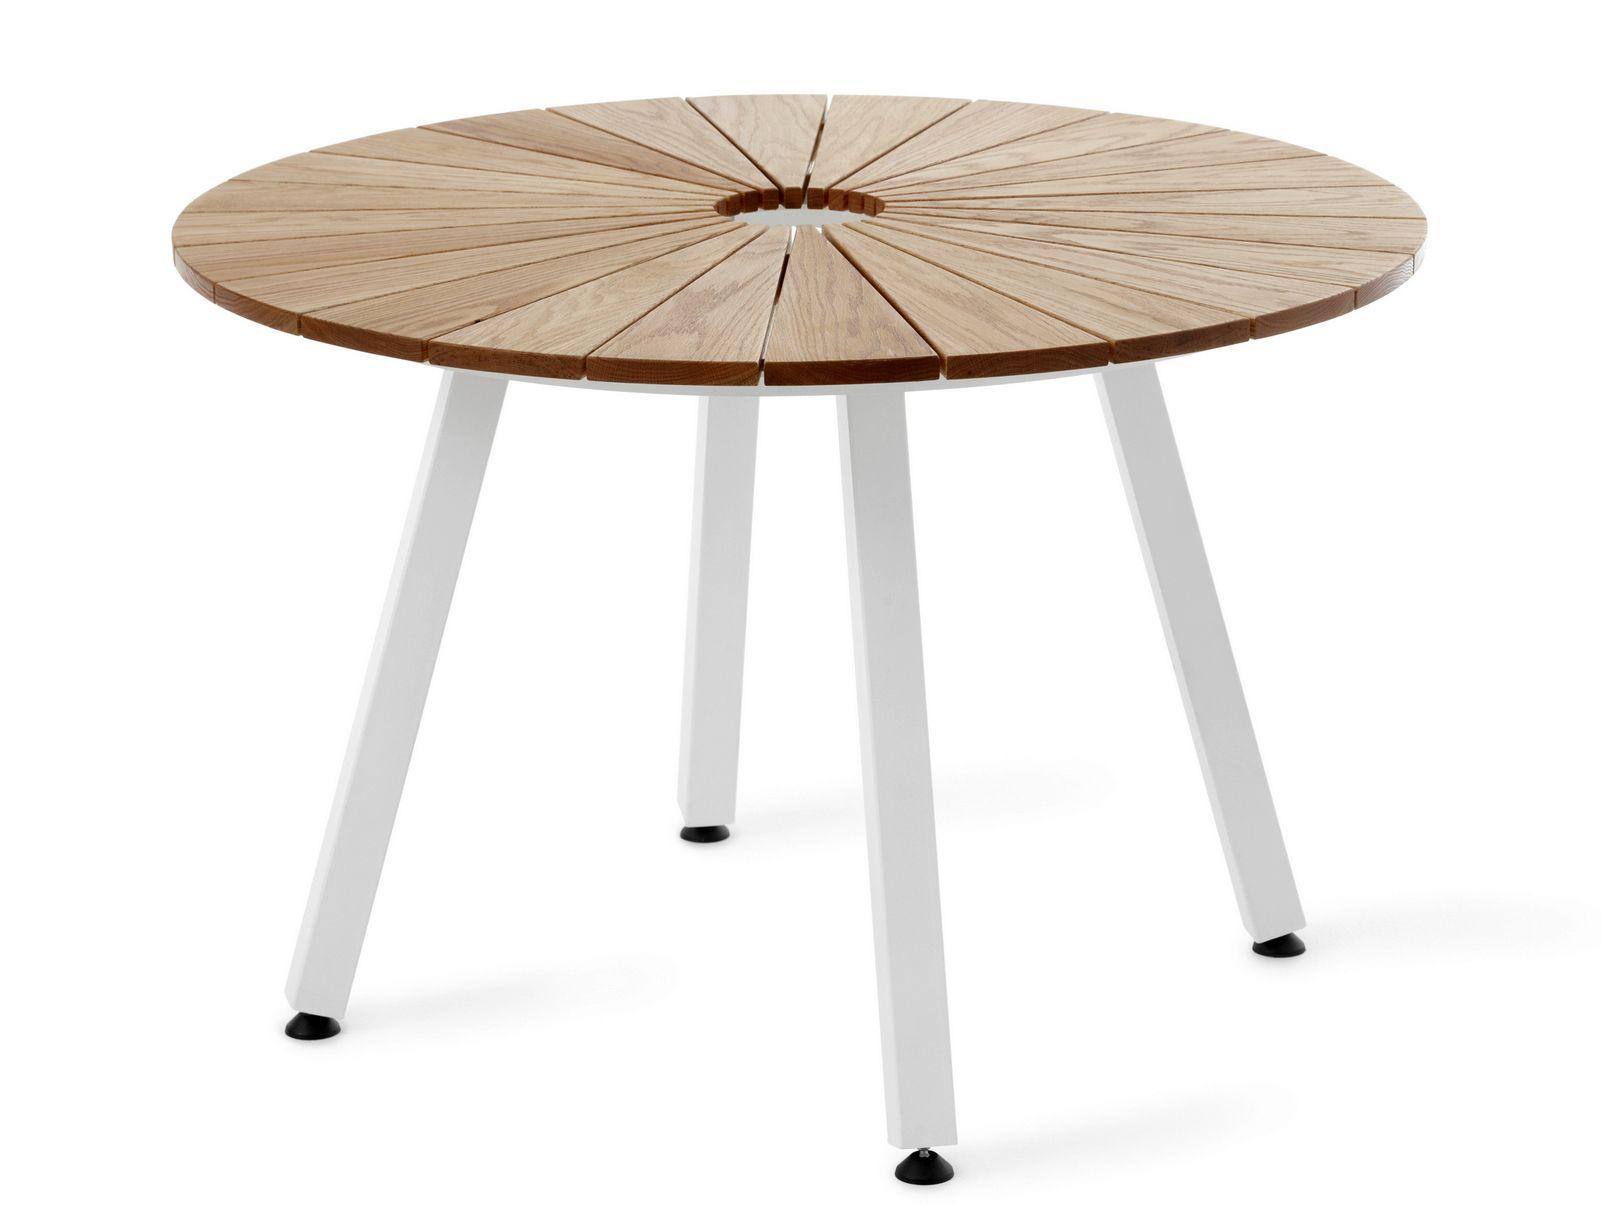 sunset gartentisch by nola industrier design mats ald n. Black Bedroom Furniture Sets. Home Design Ideas